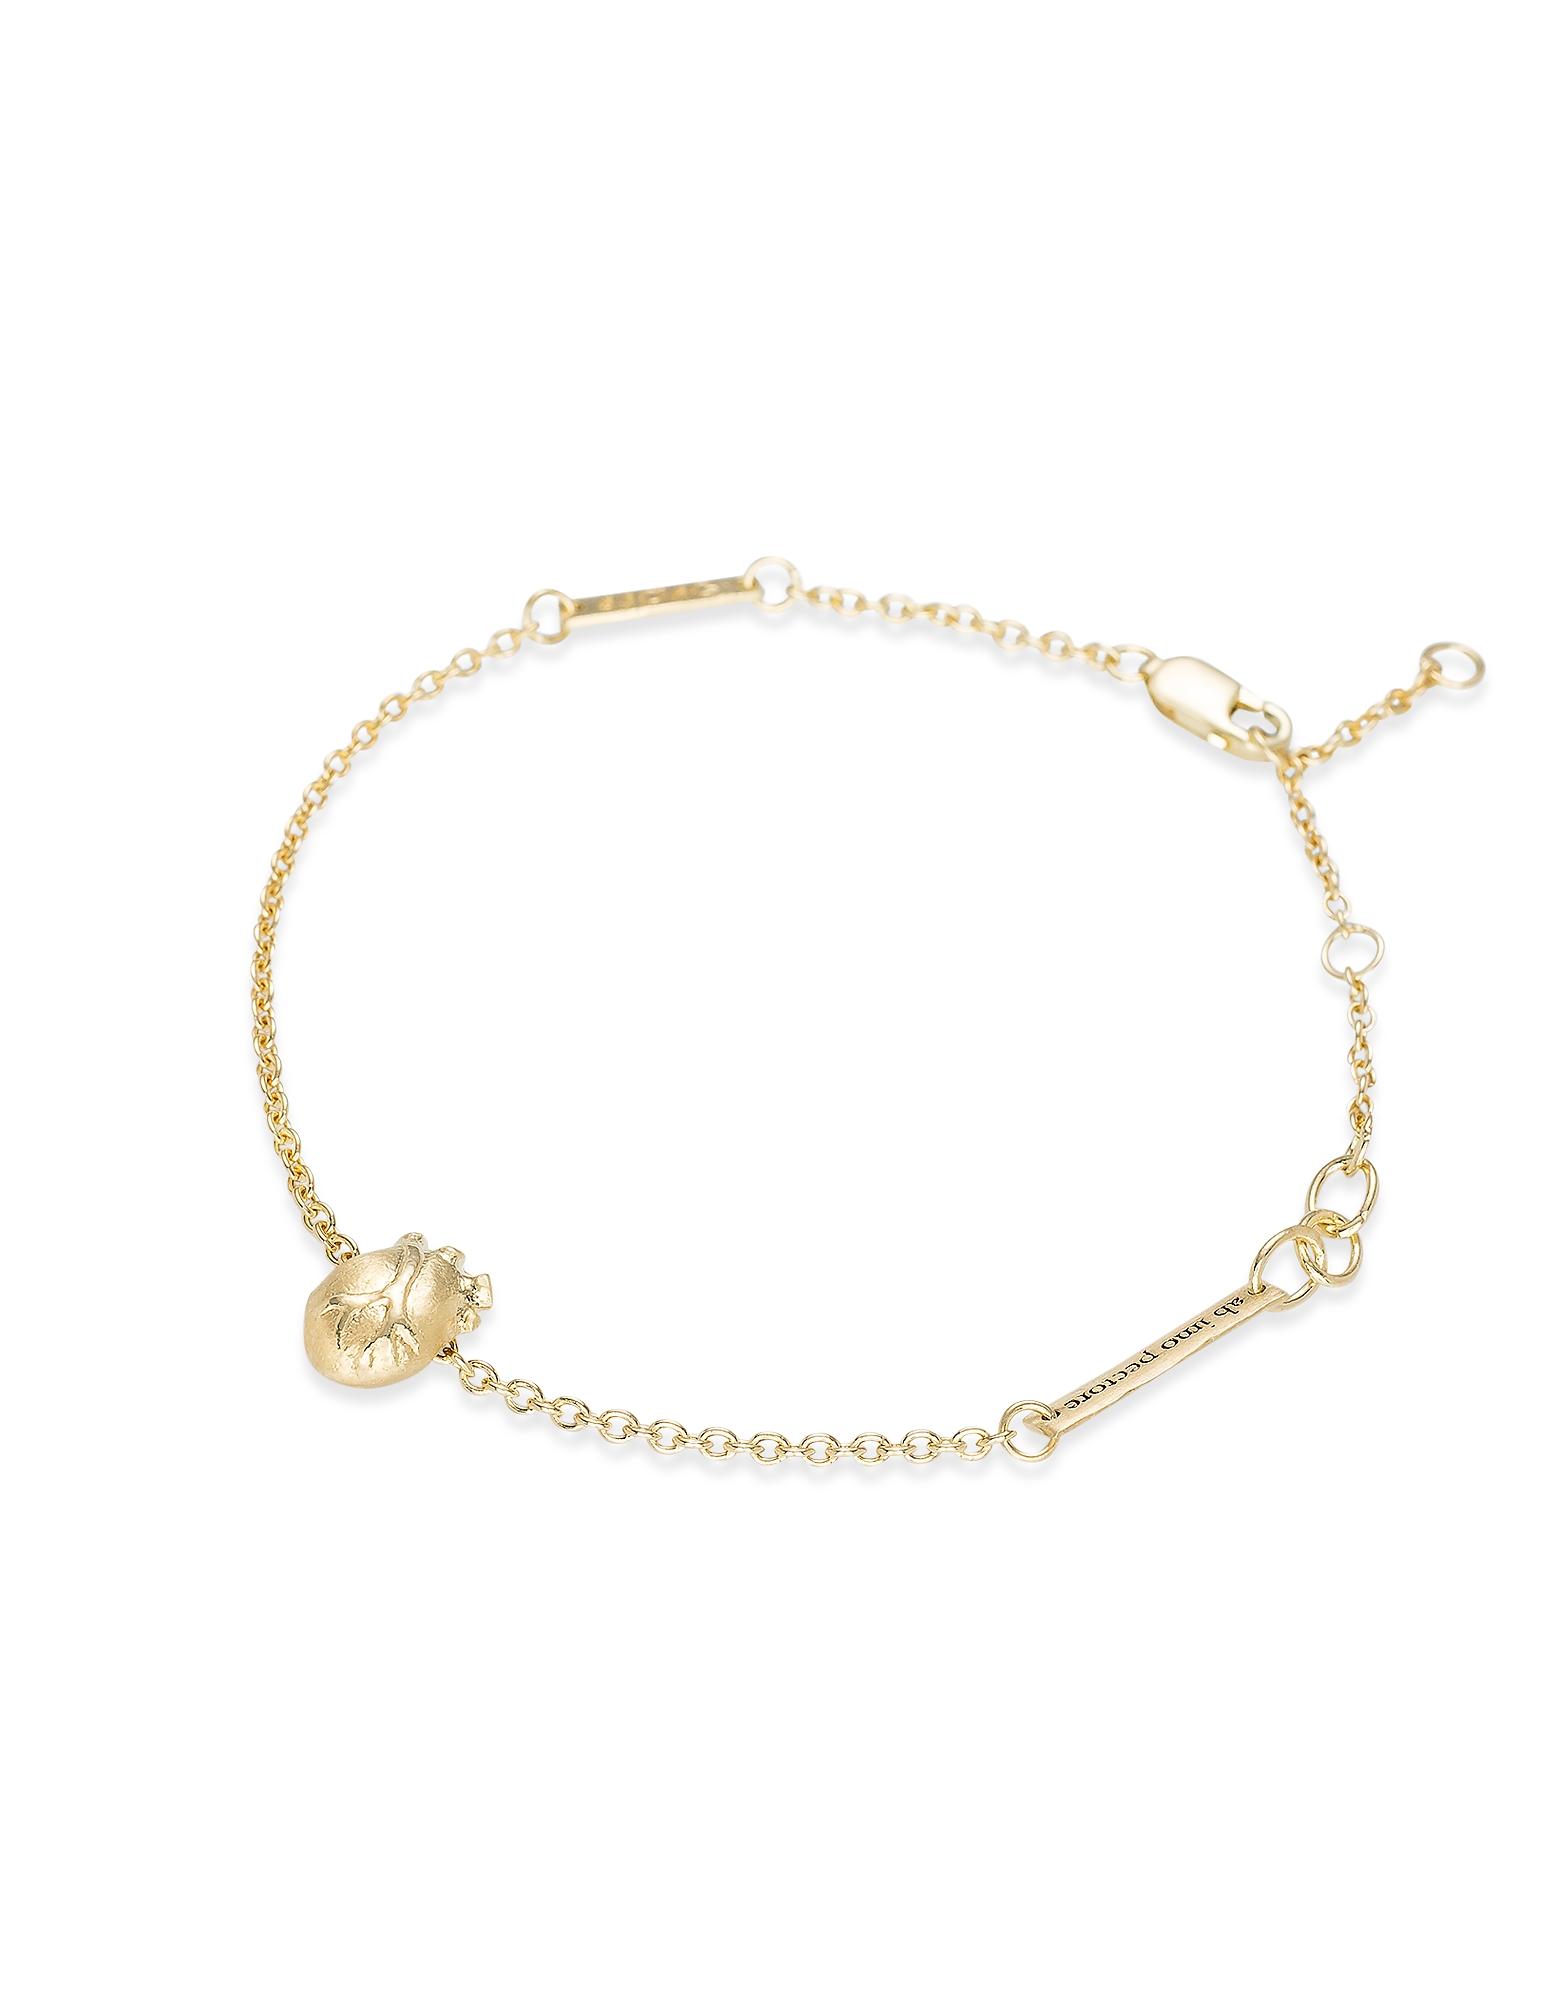 Small Gold Anatomic Heart Bracelet